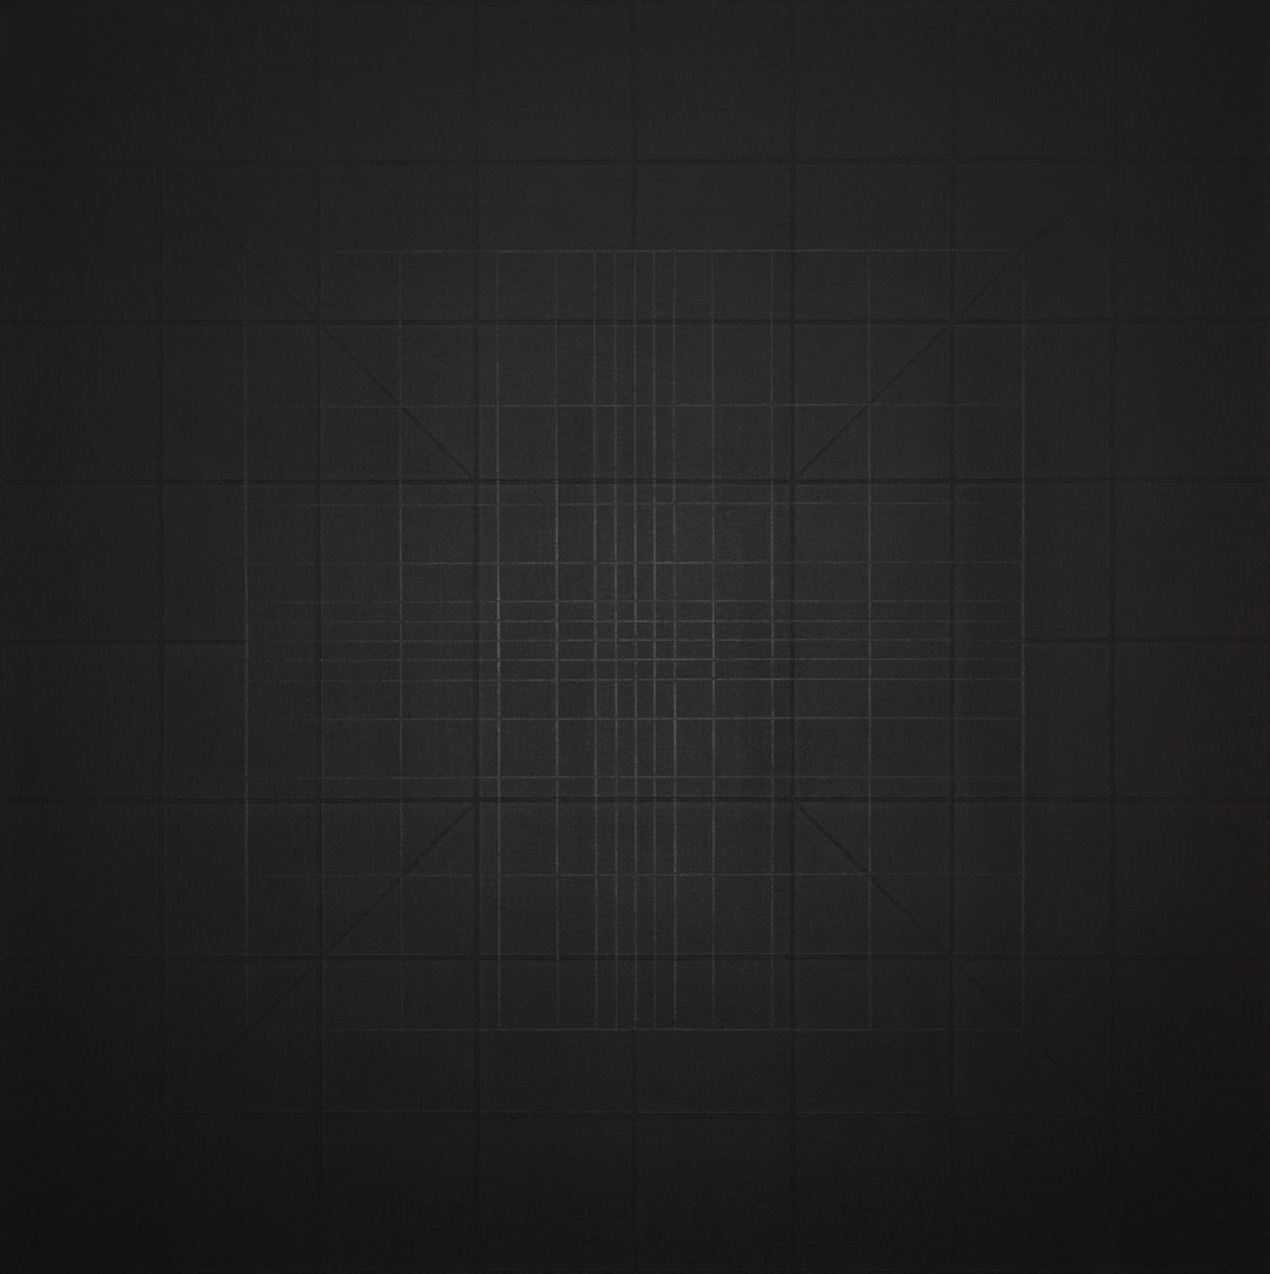 Yantra-ipsum-arkhē(1)2011.Feb, acrylic on canvas, 35 7/16 x 35 7/16 in. [90x90cm]-2